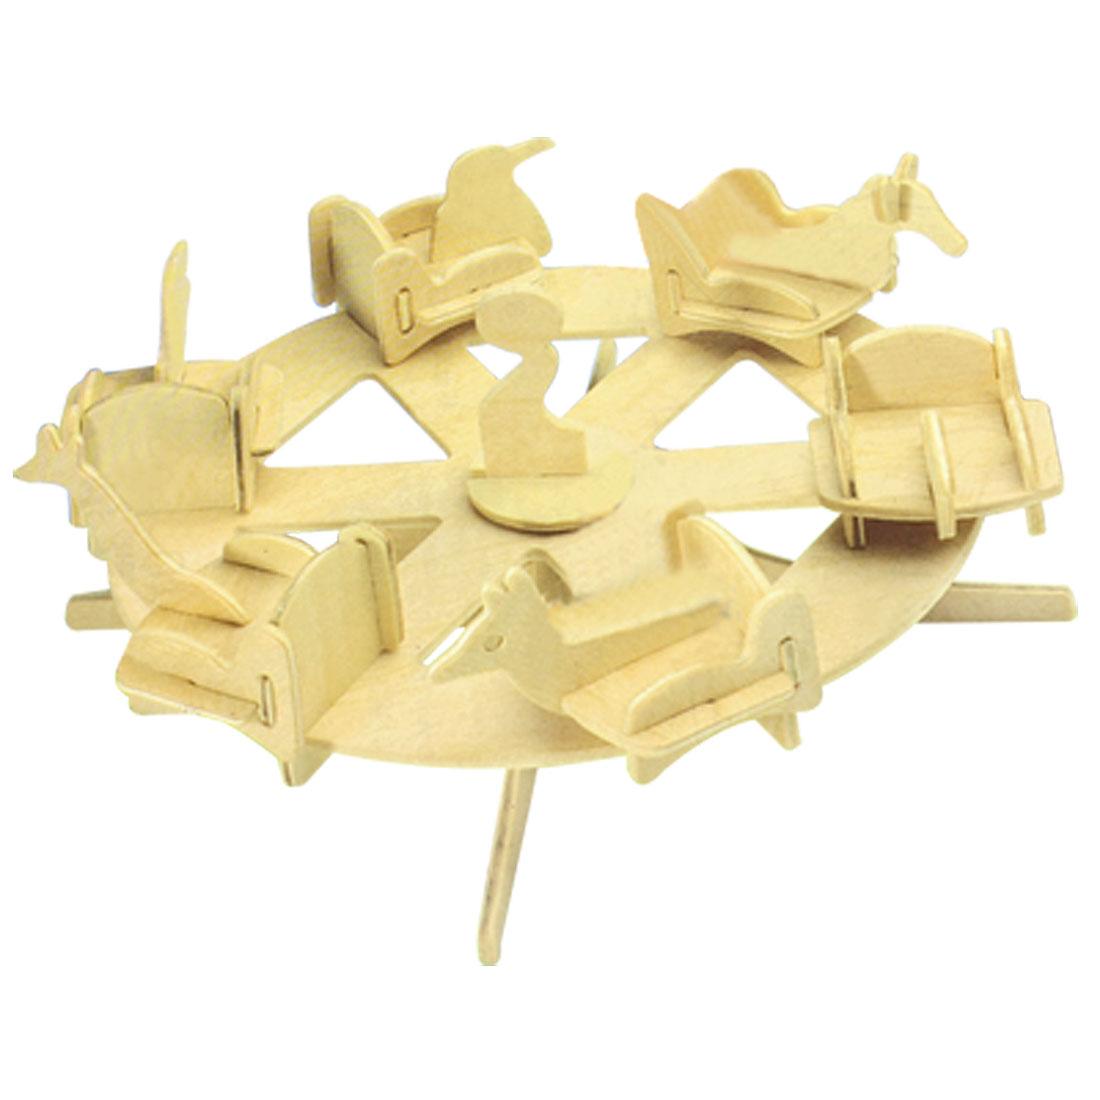 Child Wood Craft Assemble 3D Roundabout Model Construction Kit DIY Toy